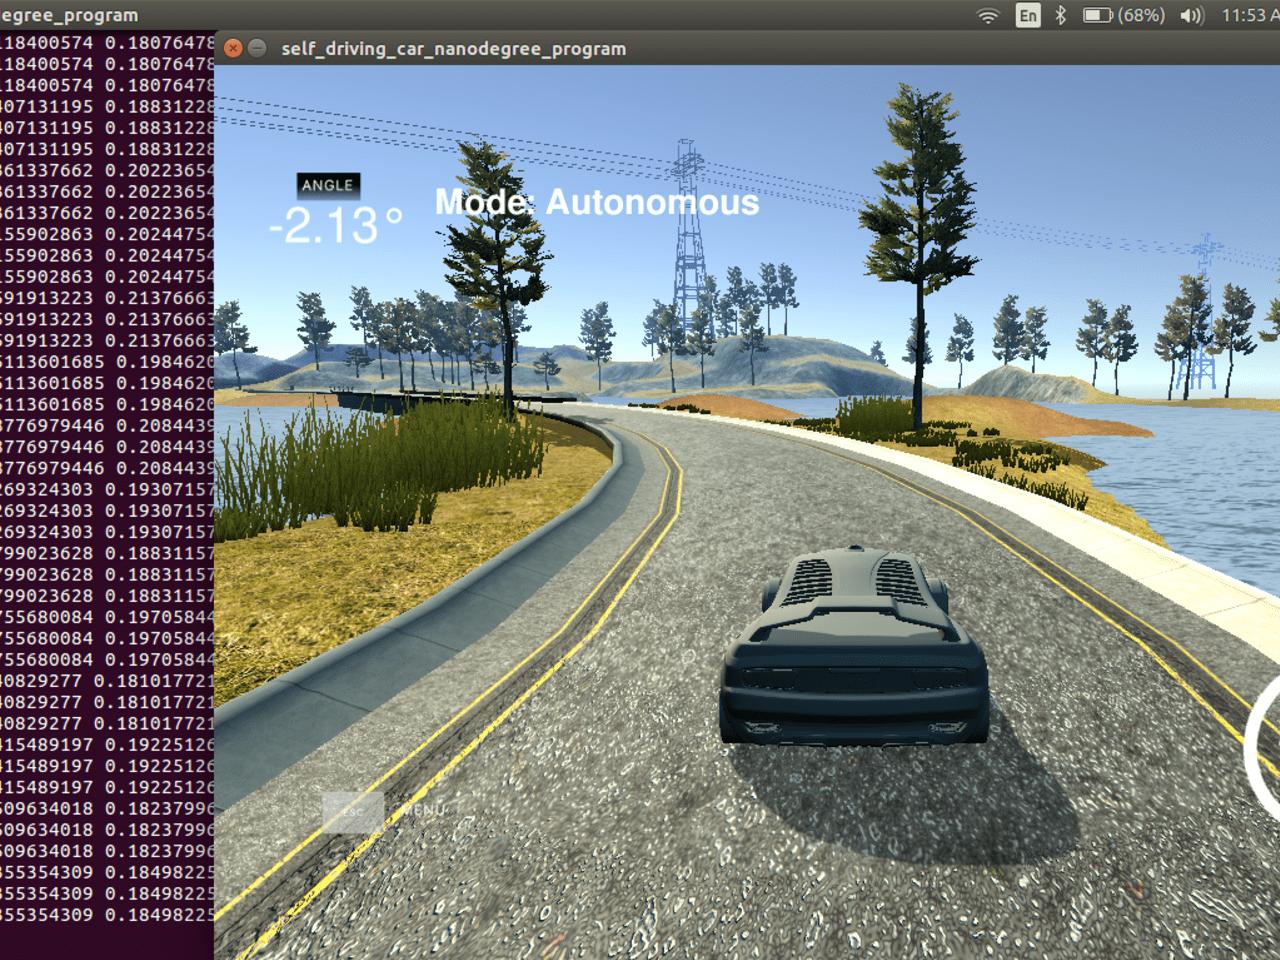 Behavioral Cloning - Self Driving Cars | Intel DevMesh